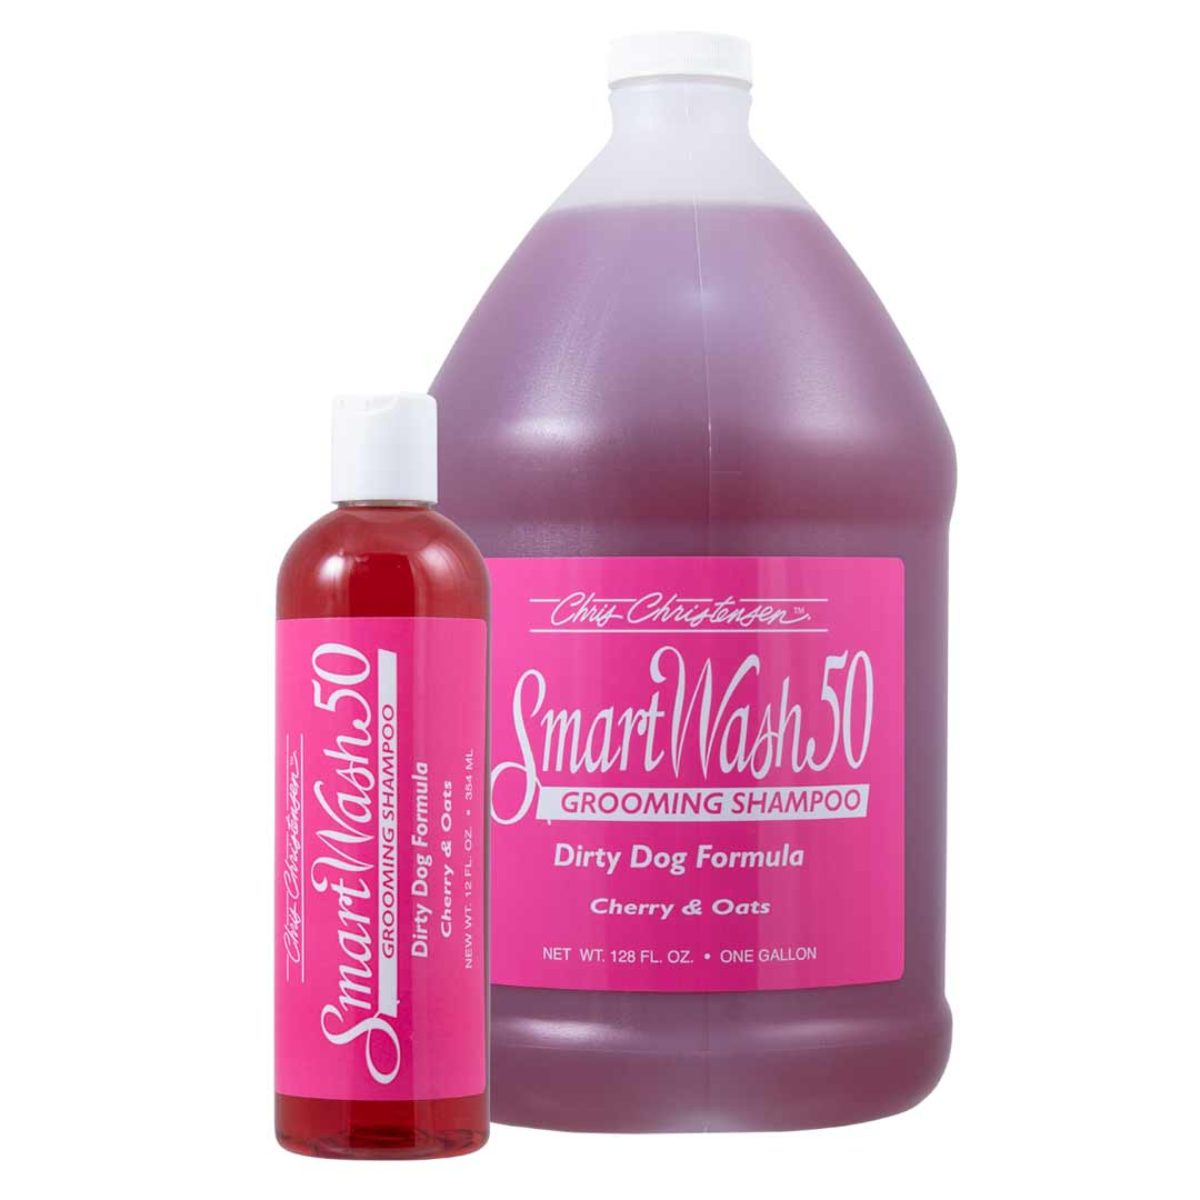 Chris Christensen SmartWash Cherry & Oats Grooming Shampoo